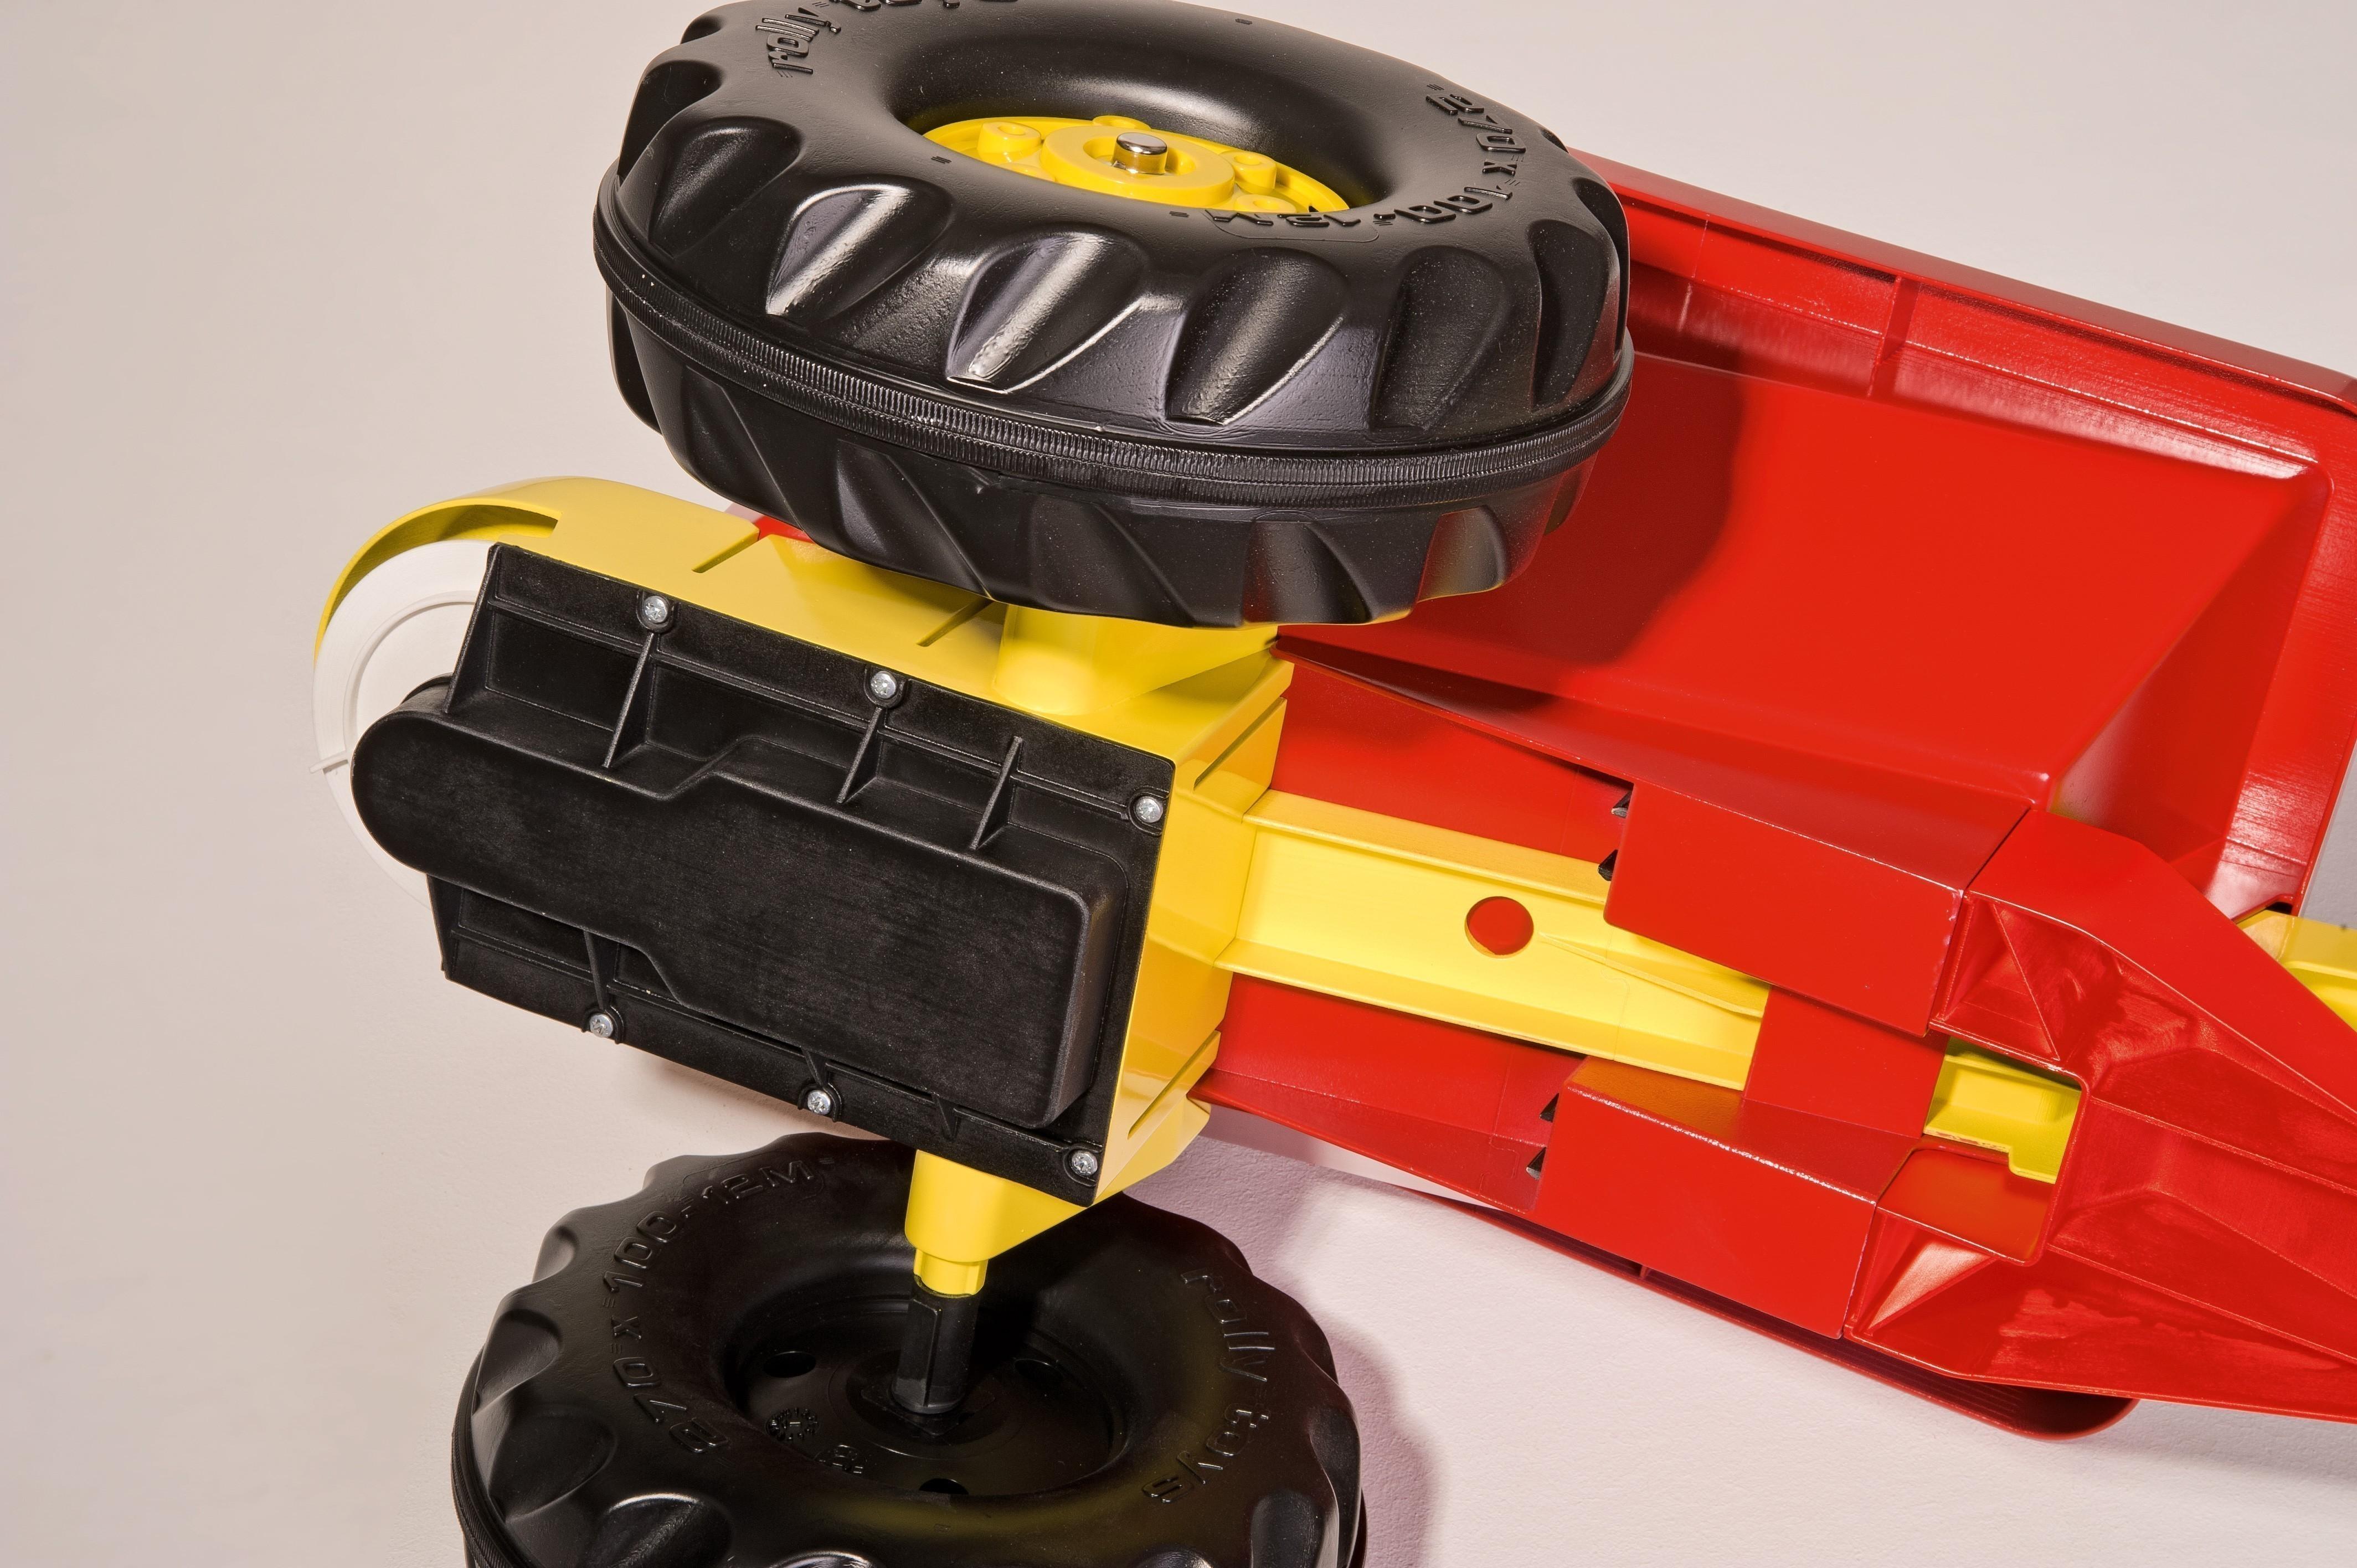 Anhänger für Tretfahrzeug rolly Streumax rot - Rolly Toys Bild 3